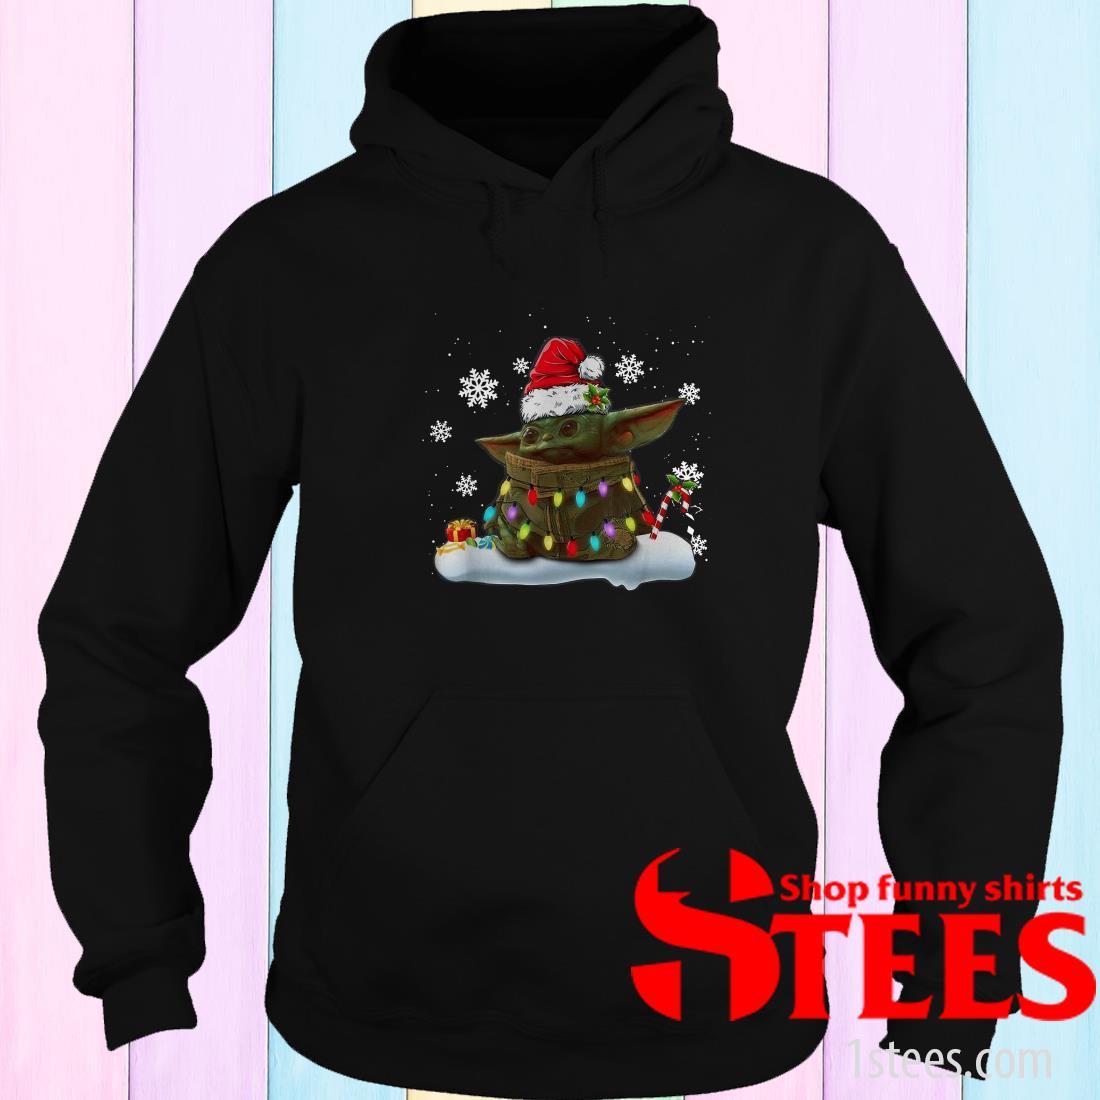 The Mandalorian Baby Yoda Christmas Sweatshirt